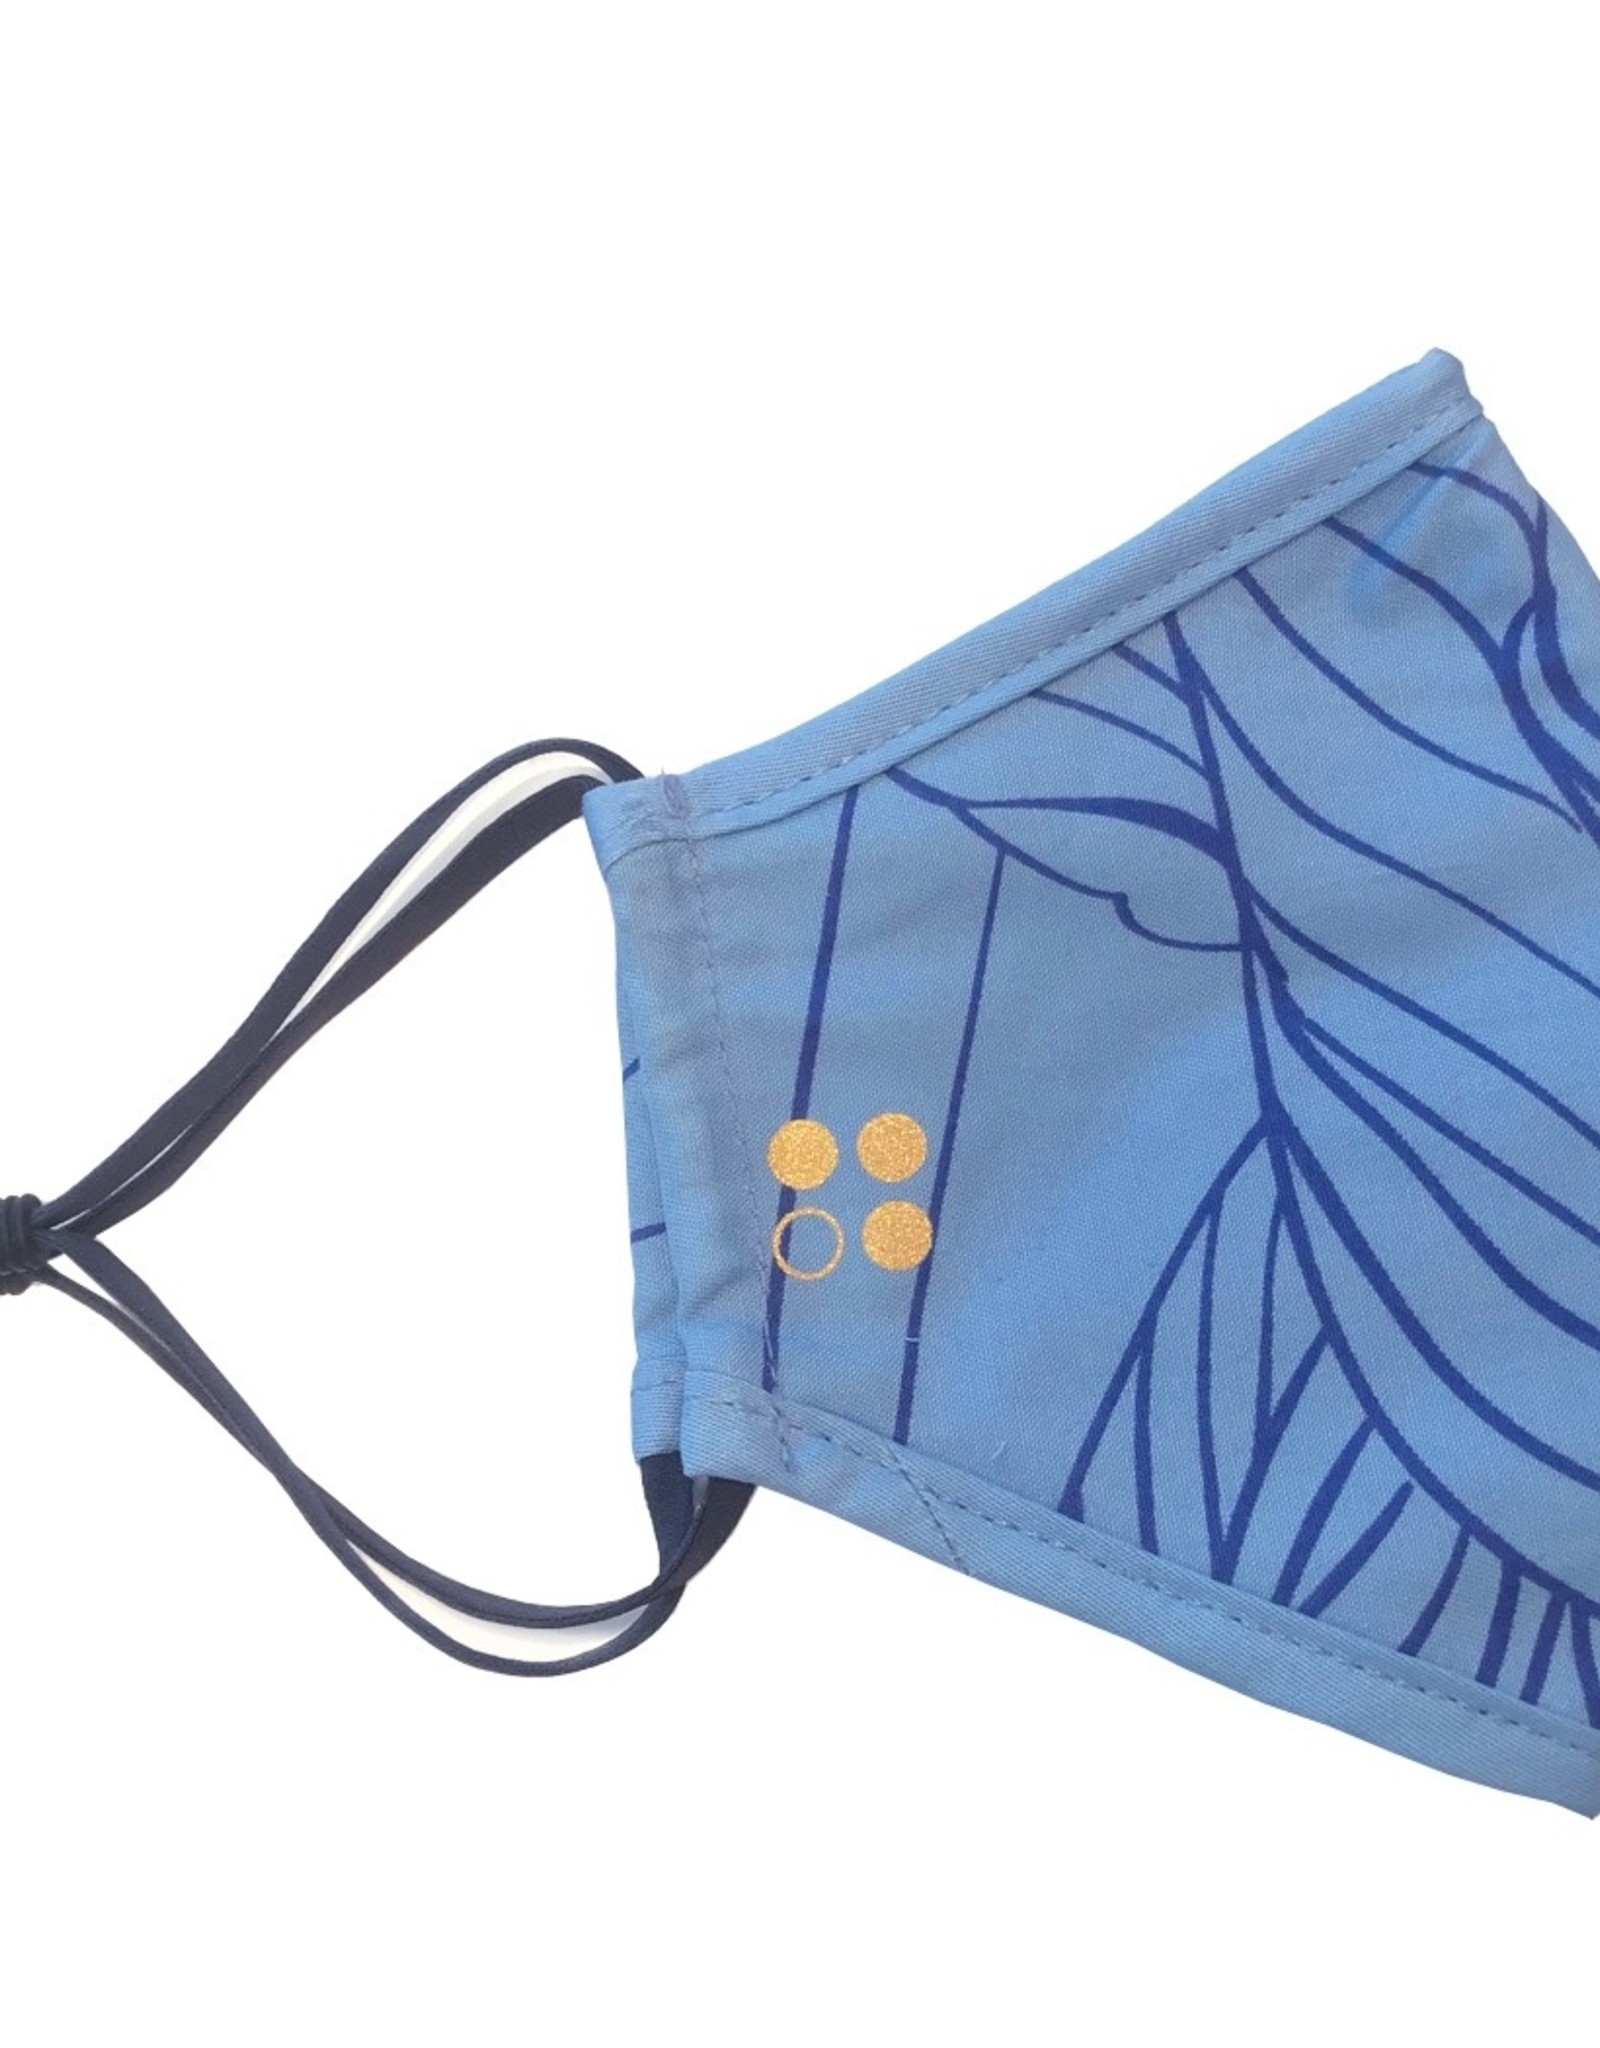 RainPharma Mondmasker Licht Blauw - Rainpharma